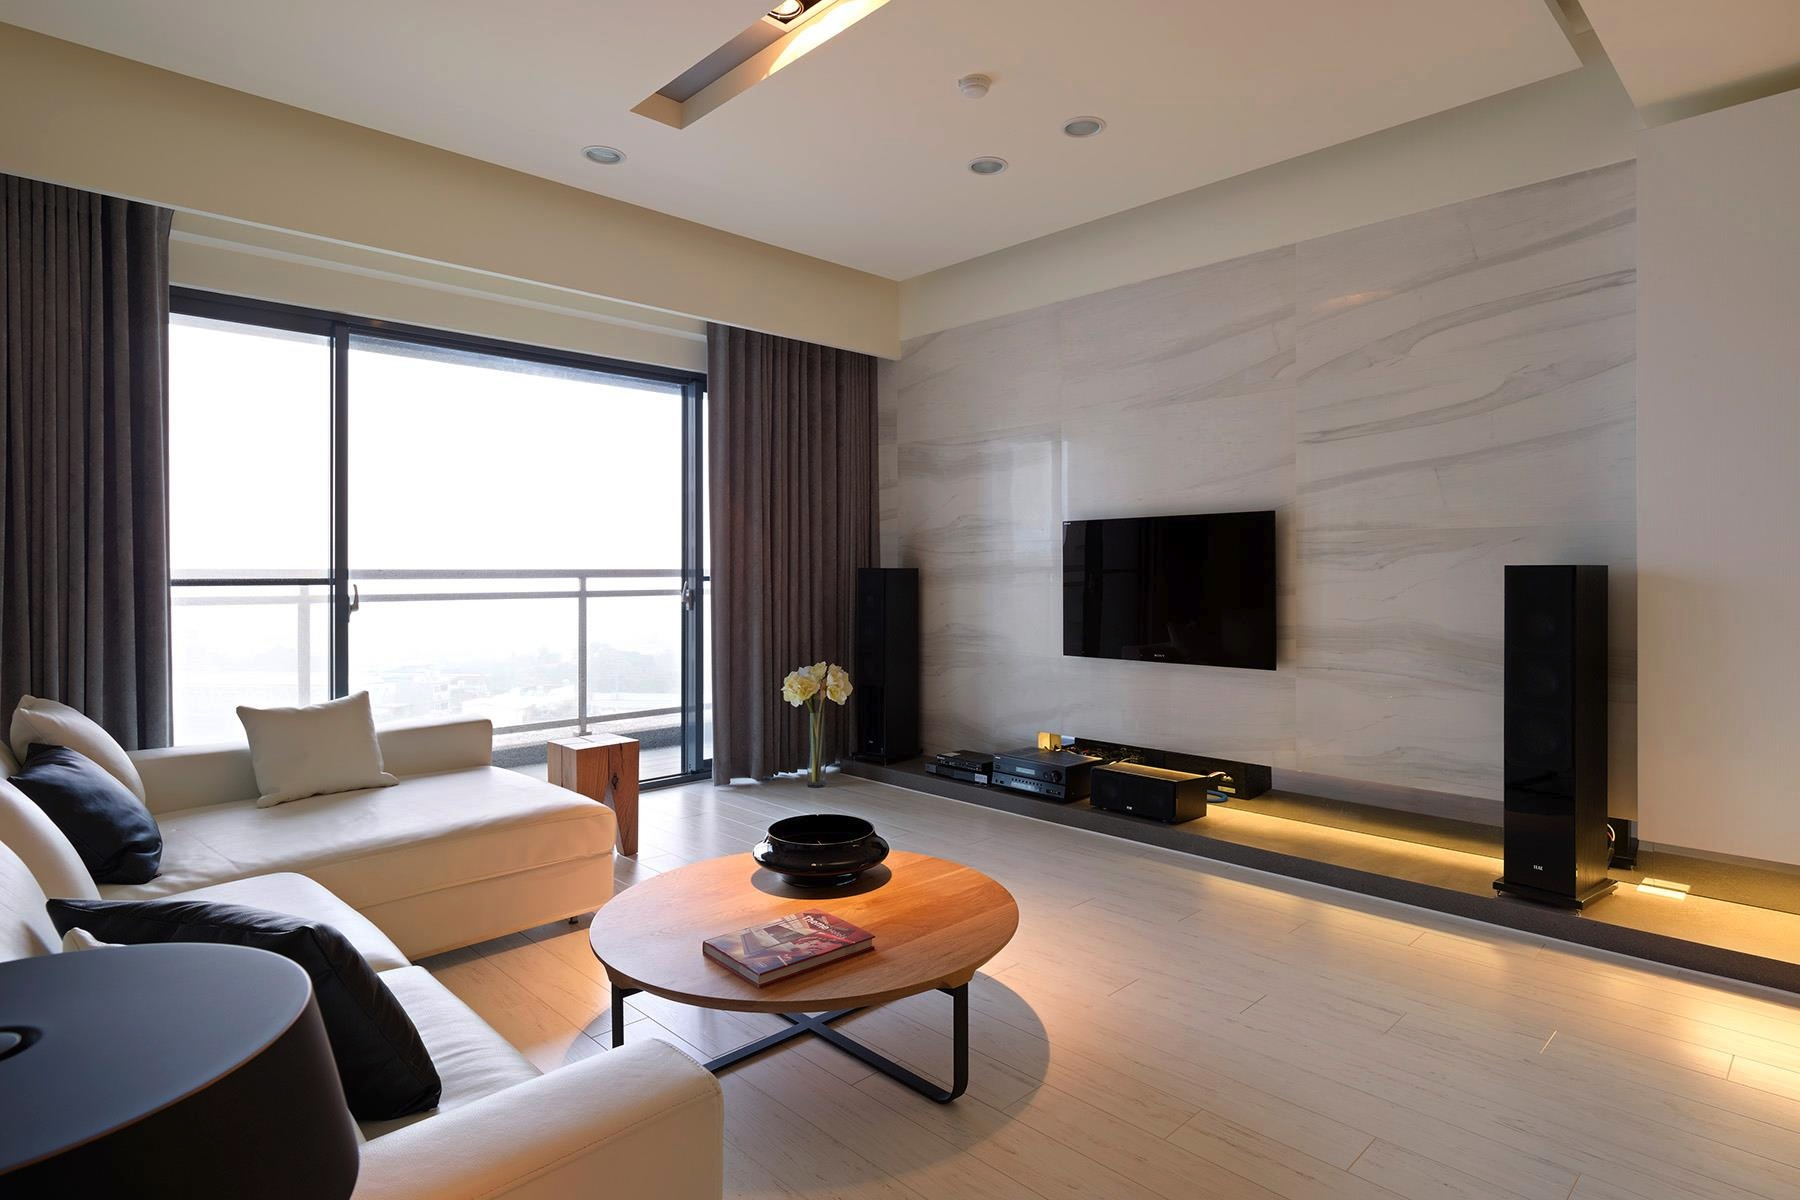 entertainment wall interior design ideas. Black Bedroom Furniture Sets. Home Design Ideas